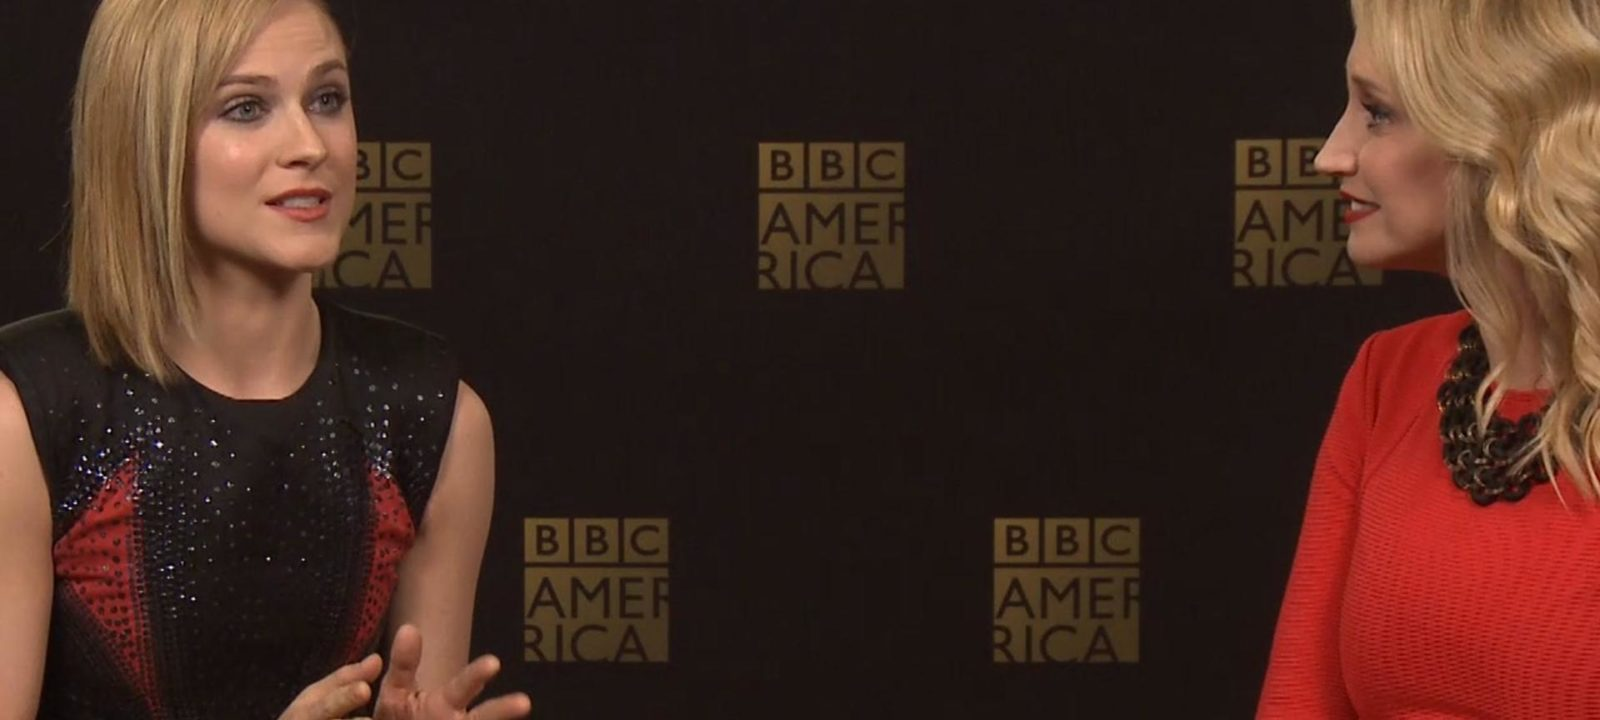 BAFTA_2017_BBCA_Tea_Party_Cut_04_Excitement_Mixed_YouTube_Preset_1920x1080_1057928259503